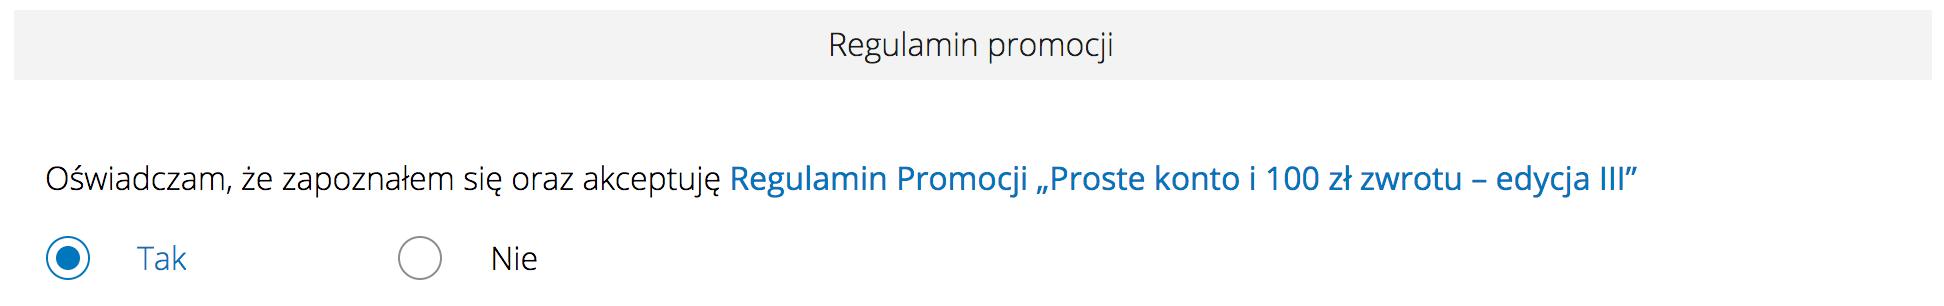 Akceptacja regulaminu w promocji mBanku mBiznes Konto Standard + 100 zł